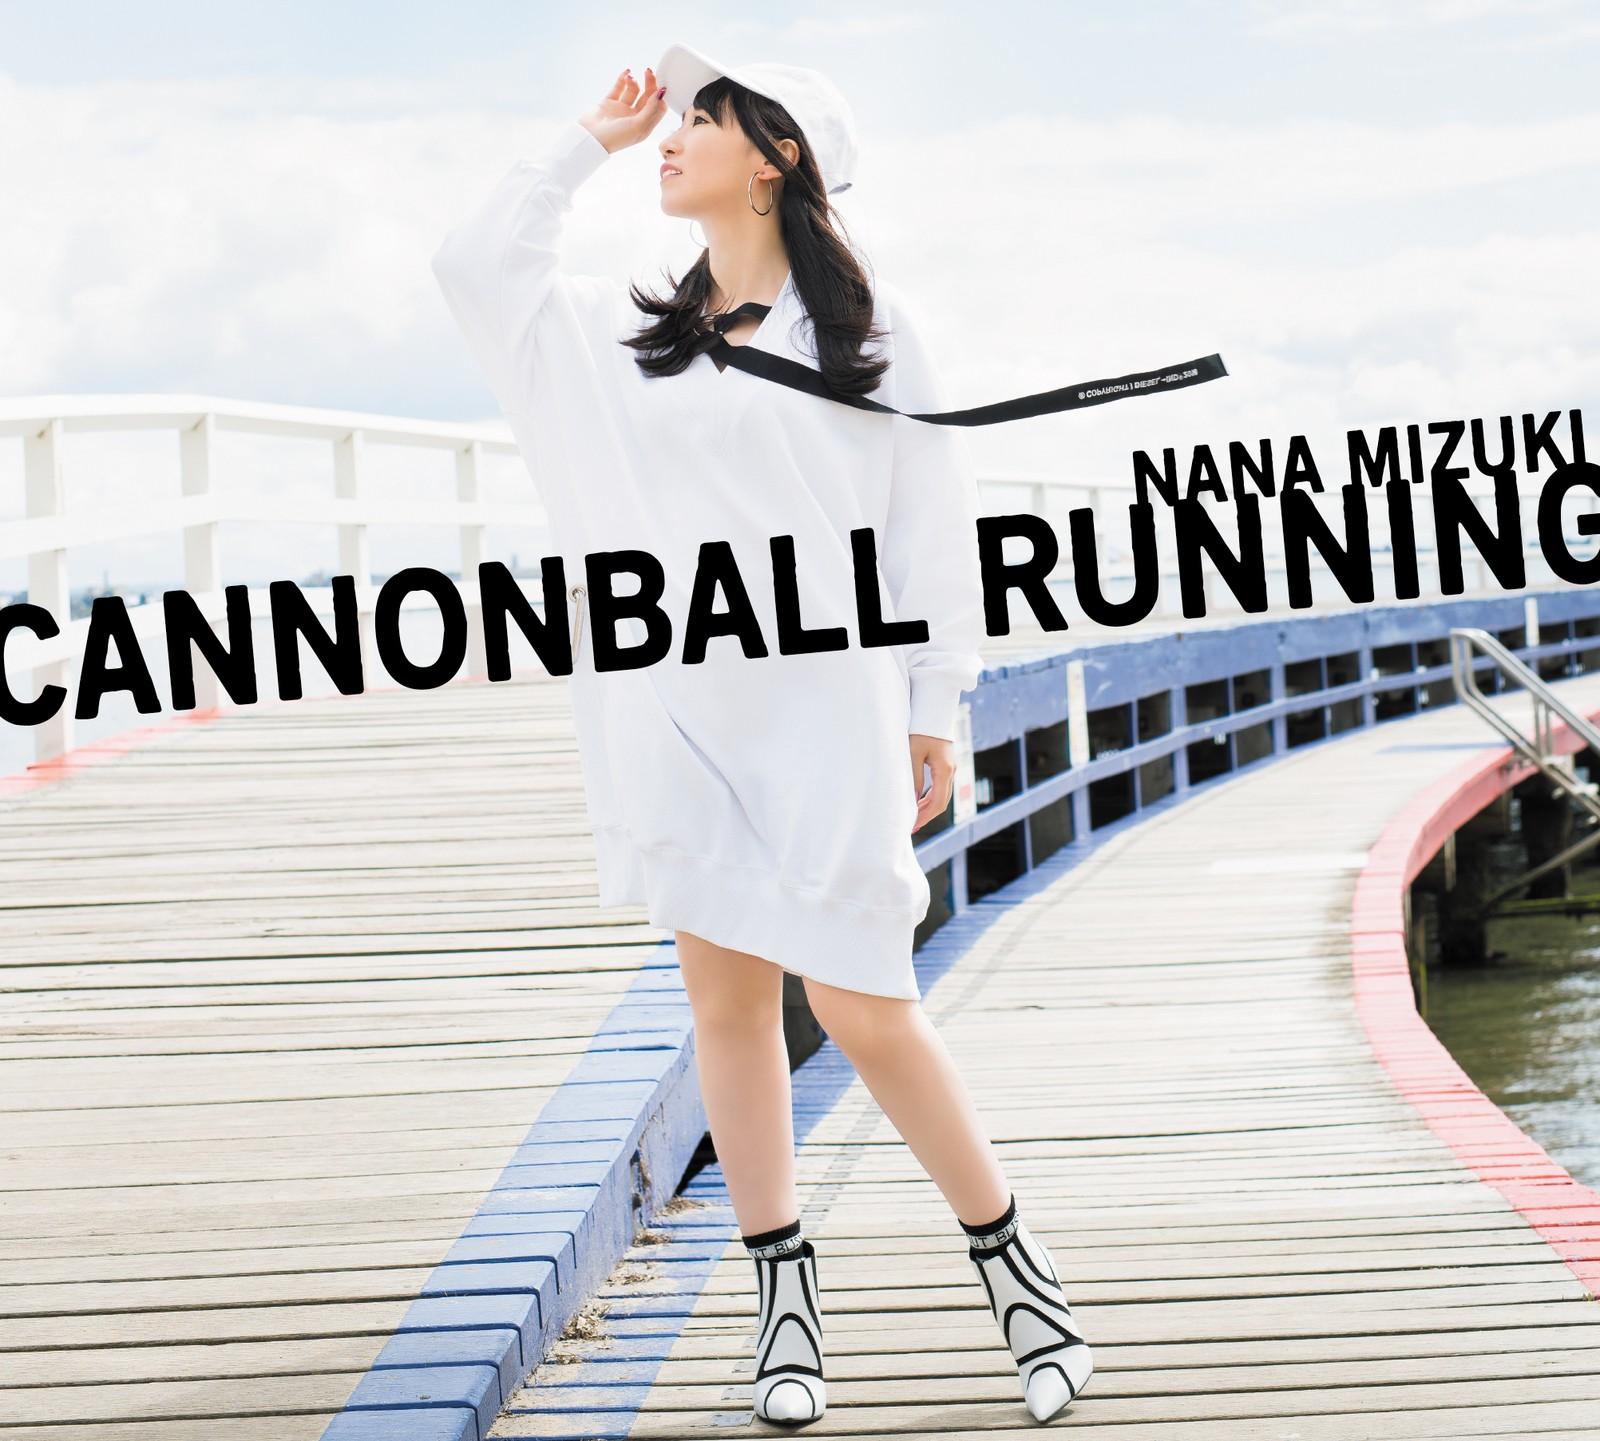 水樹奈々 (Nana Mizuki) – CANNONBALL RUNNING (2019) [FLAC + MP3 320 + Blu-ray ISO]